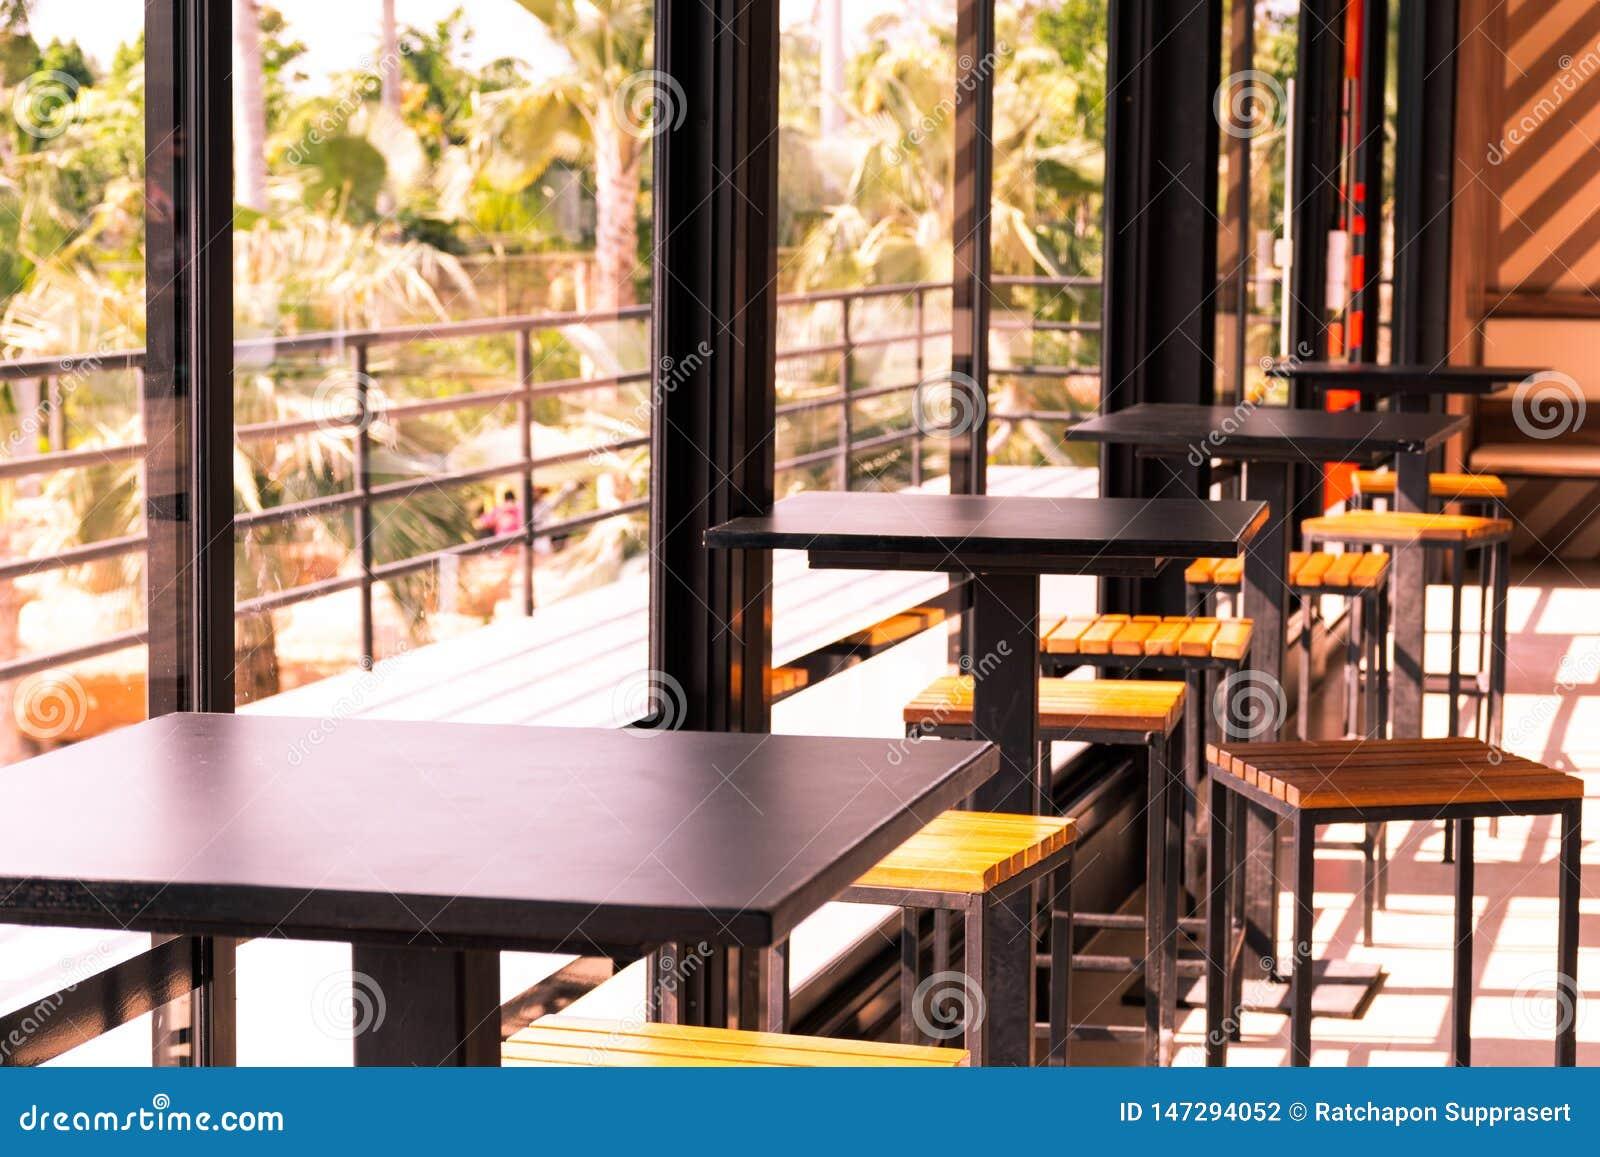 Coffee corner in the coffee shop